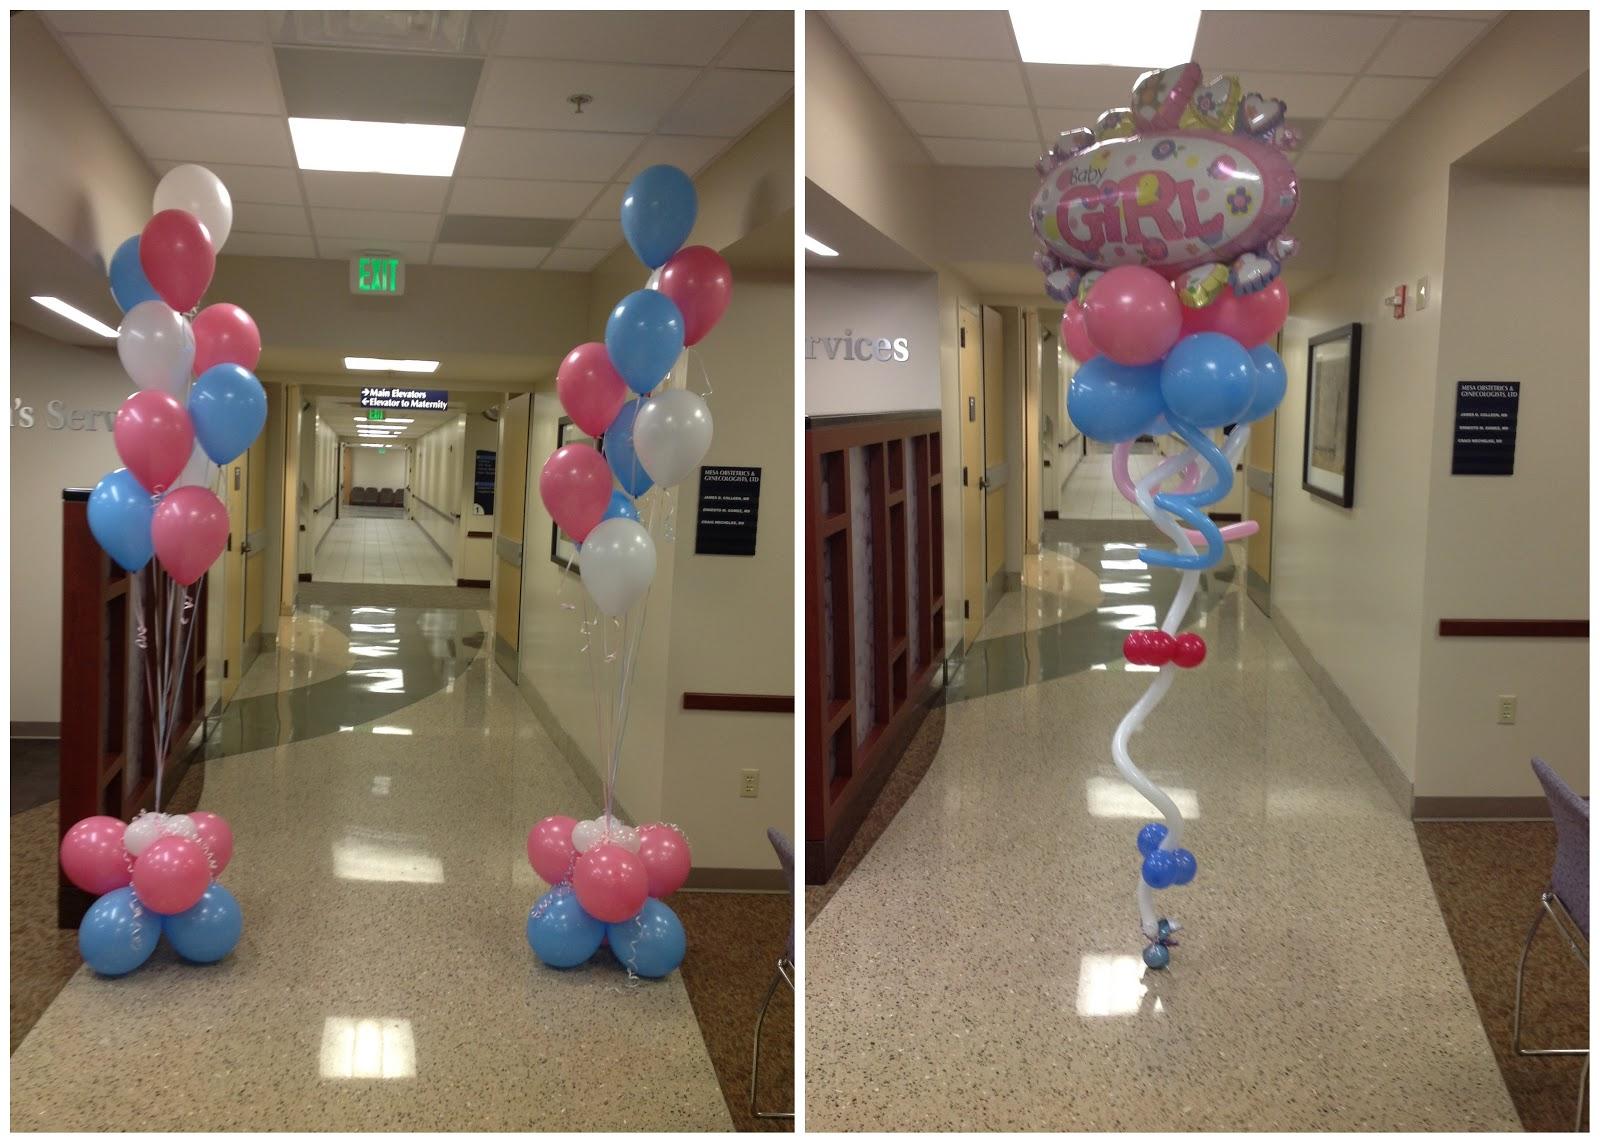 Cherri's Balloons